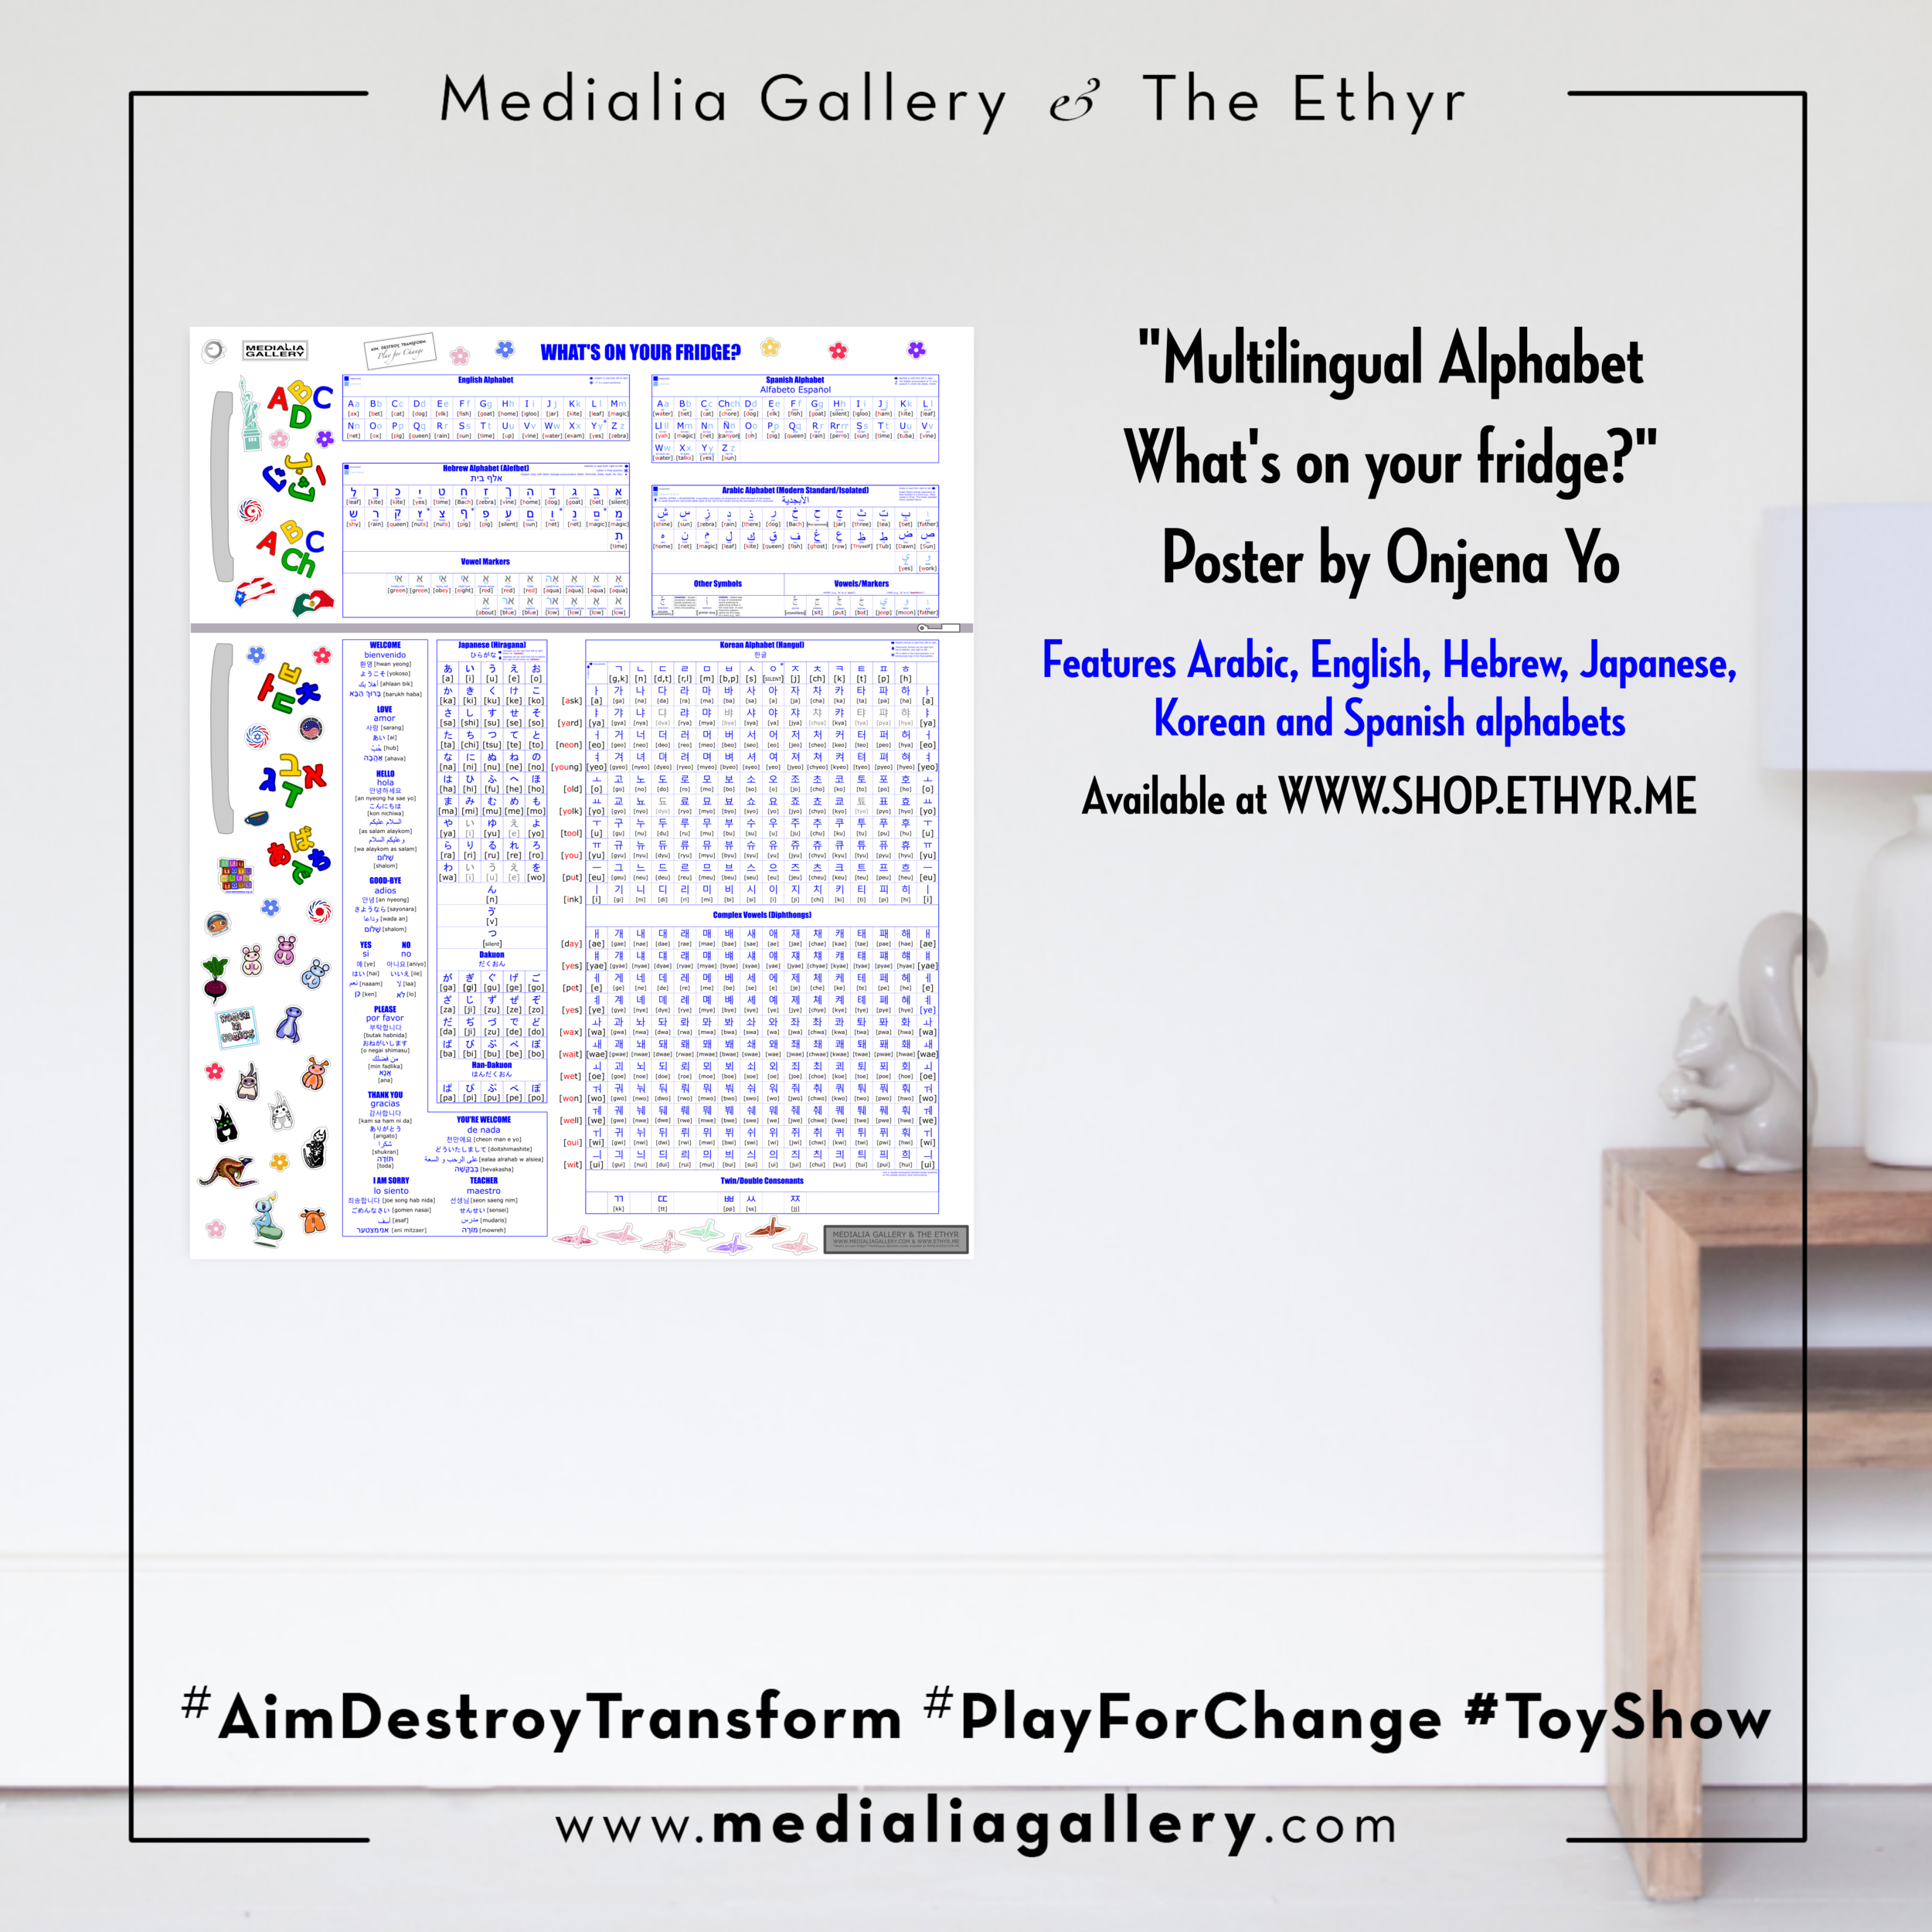 MedialiaGallery_The_Ethyr_AimDestroyTransform_Toy_Show_announcement_Multilingual_Alphabet_Fridge_Poster_Onjena_Yo_November_2017.jpg.png